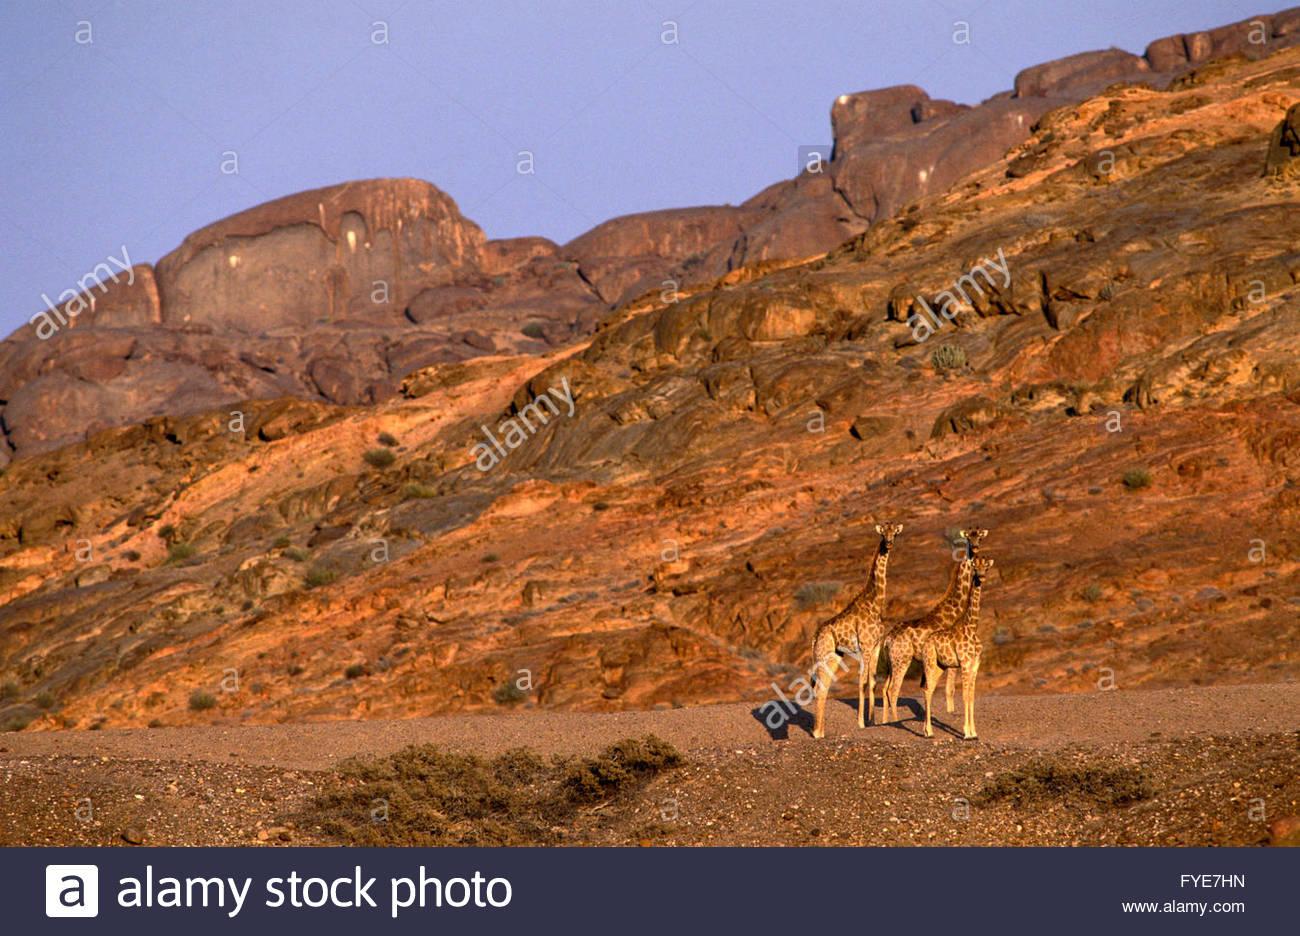 Girafes on Skeleton coast Namibia. - Stock Image